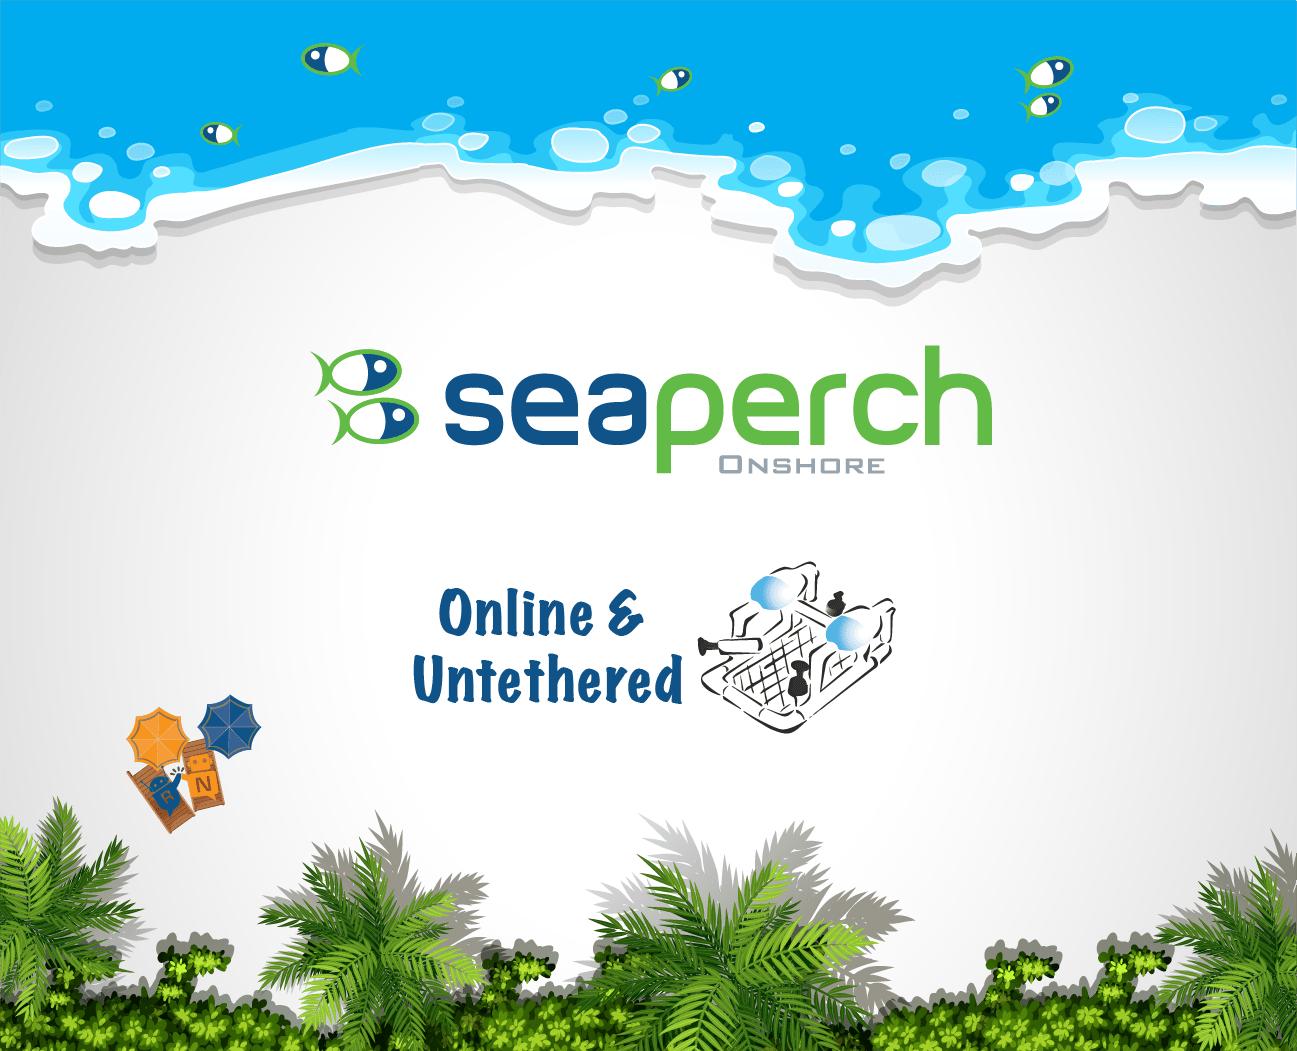 SeaPerch Onshore